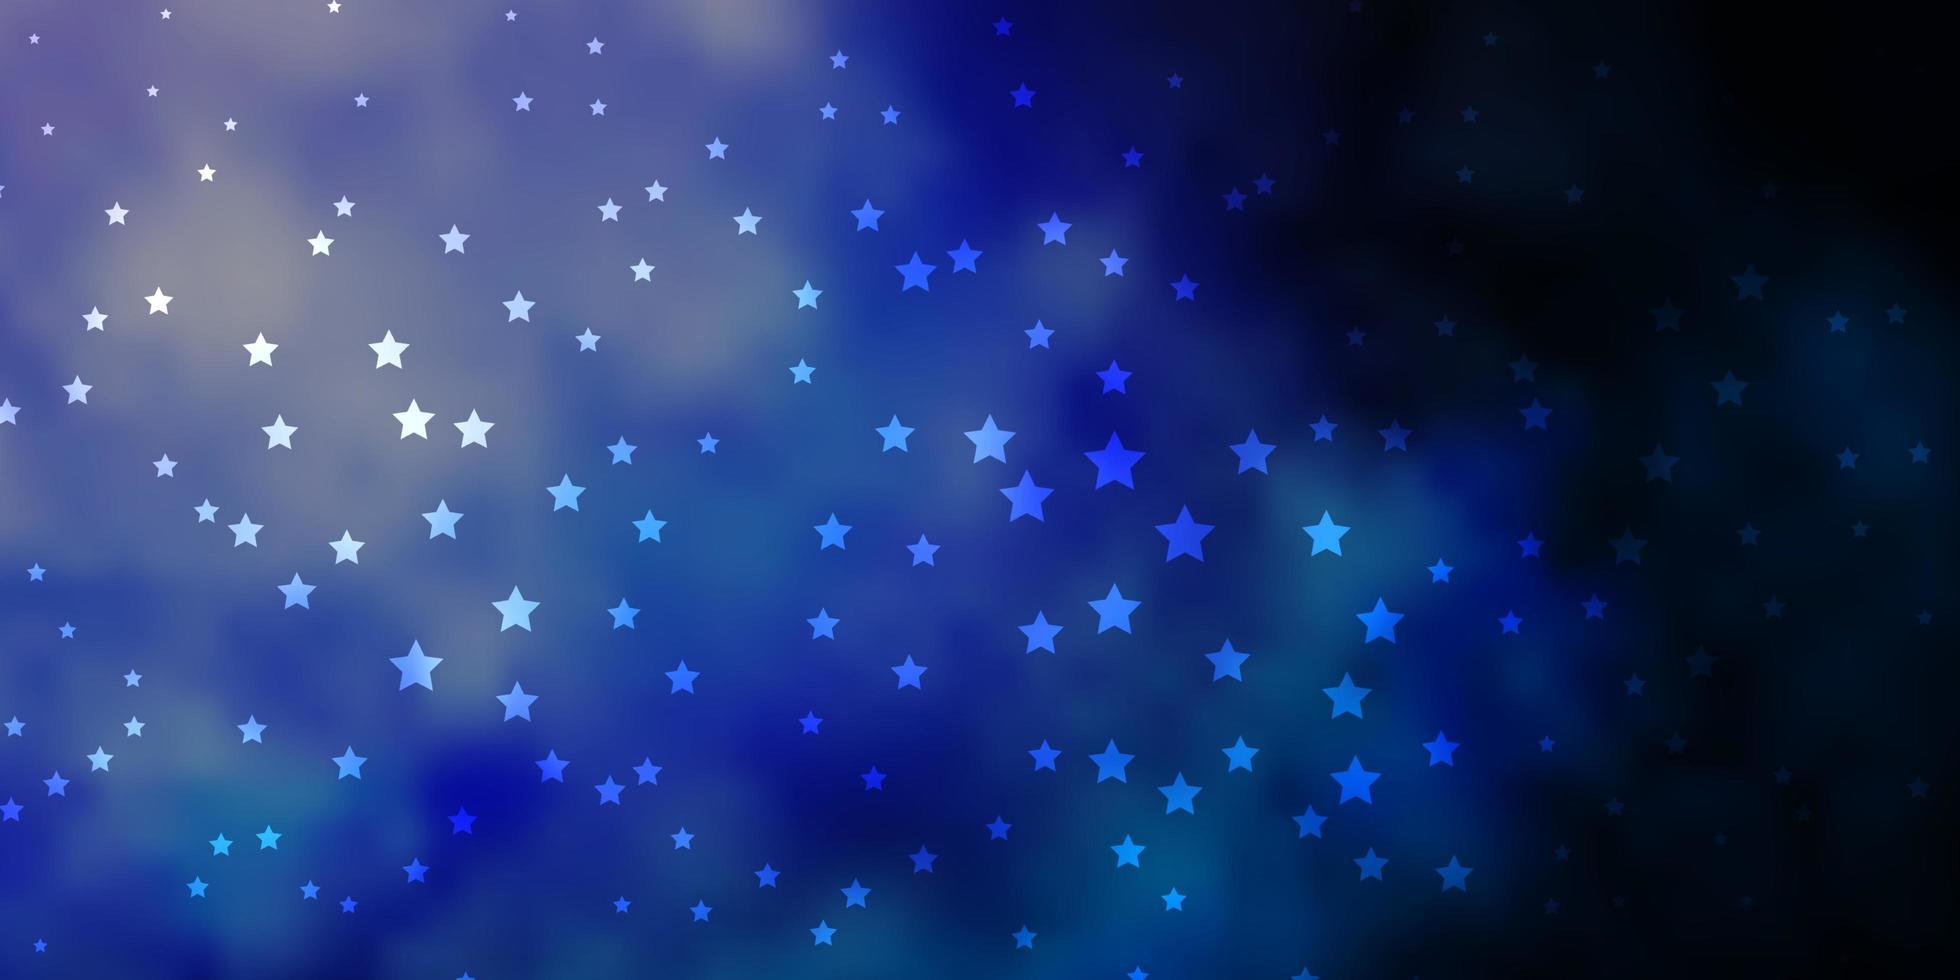 Fondo de vector púrpura oscuro con estrellas de colores.